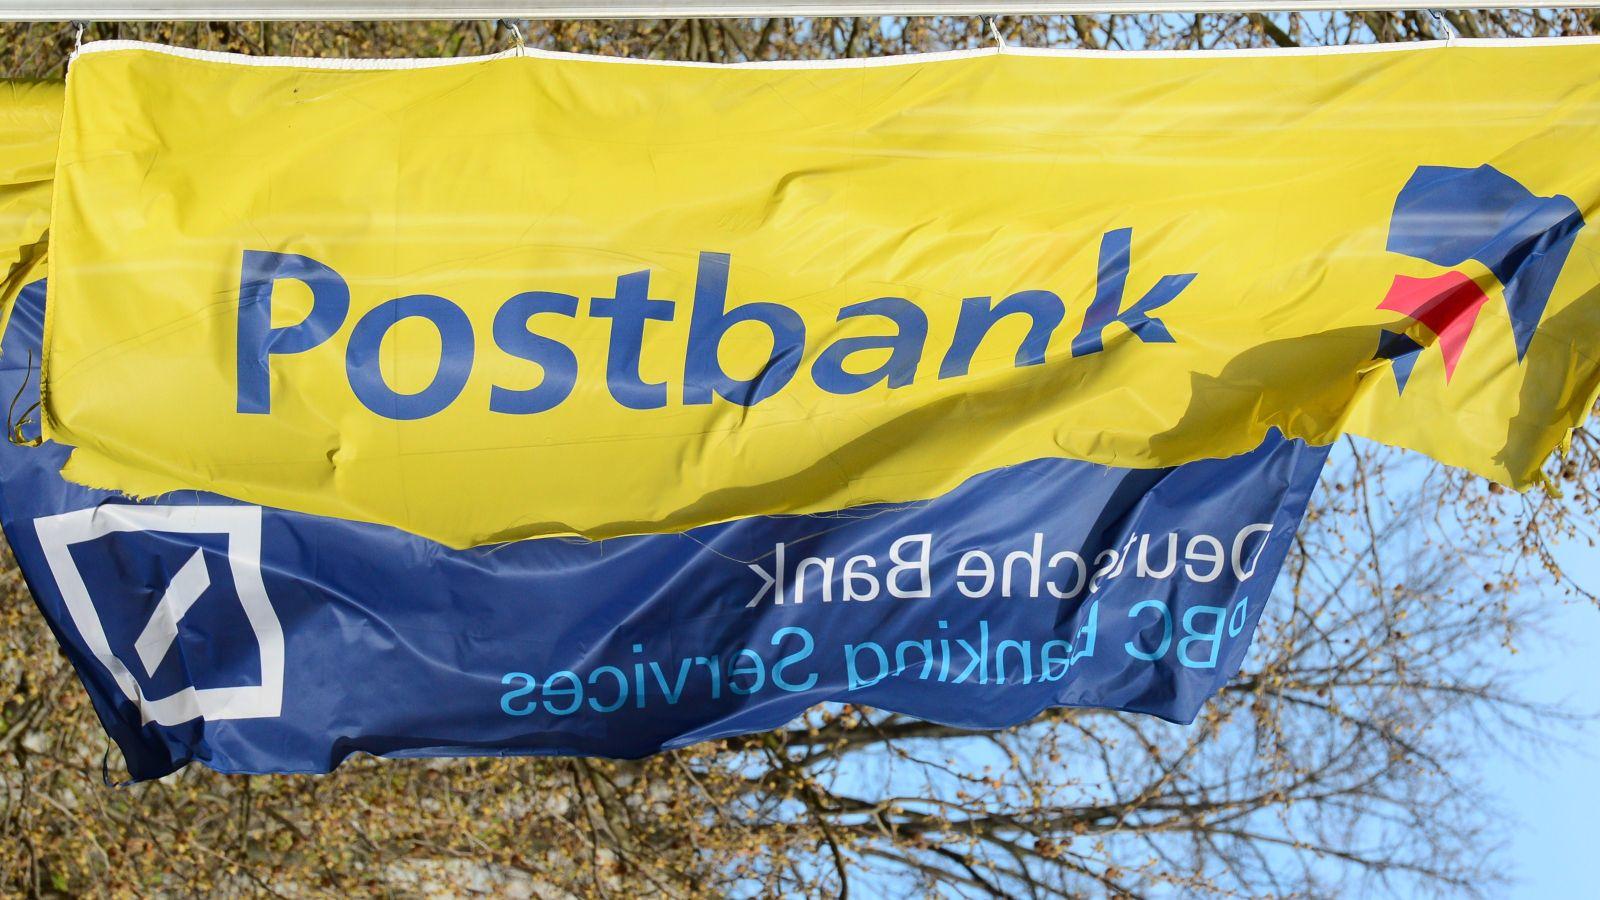 GERMANY-BANKING-STRIKE-POSTBANK-DEUTSCHE-BANK (Kopie)